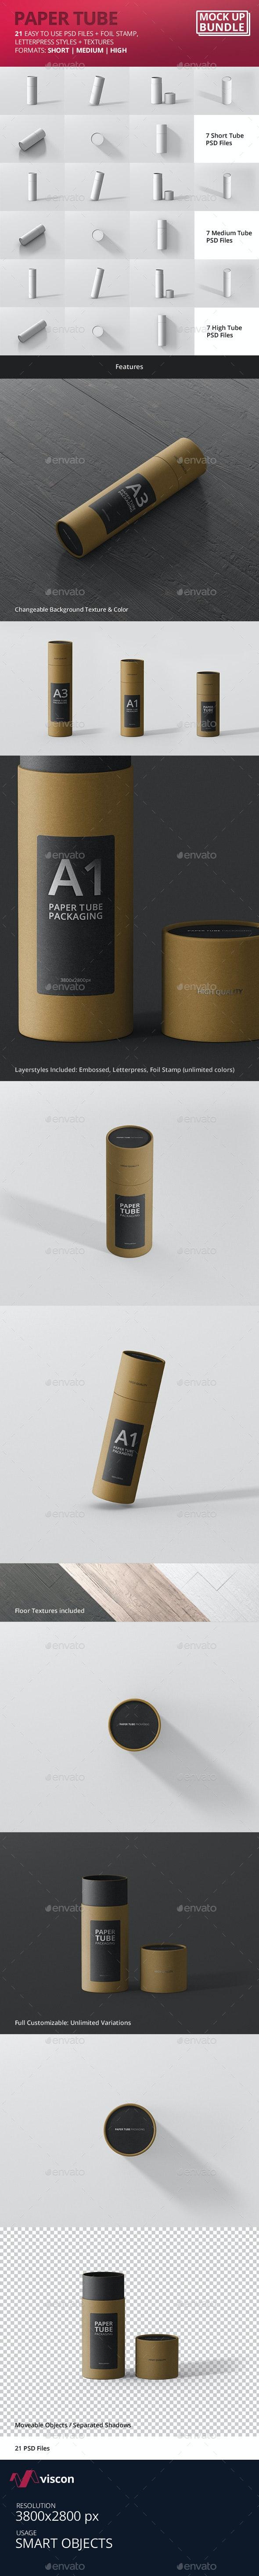 Slim Paper Tube Mockup Bundle - Miscellaneous Packaging